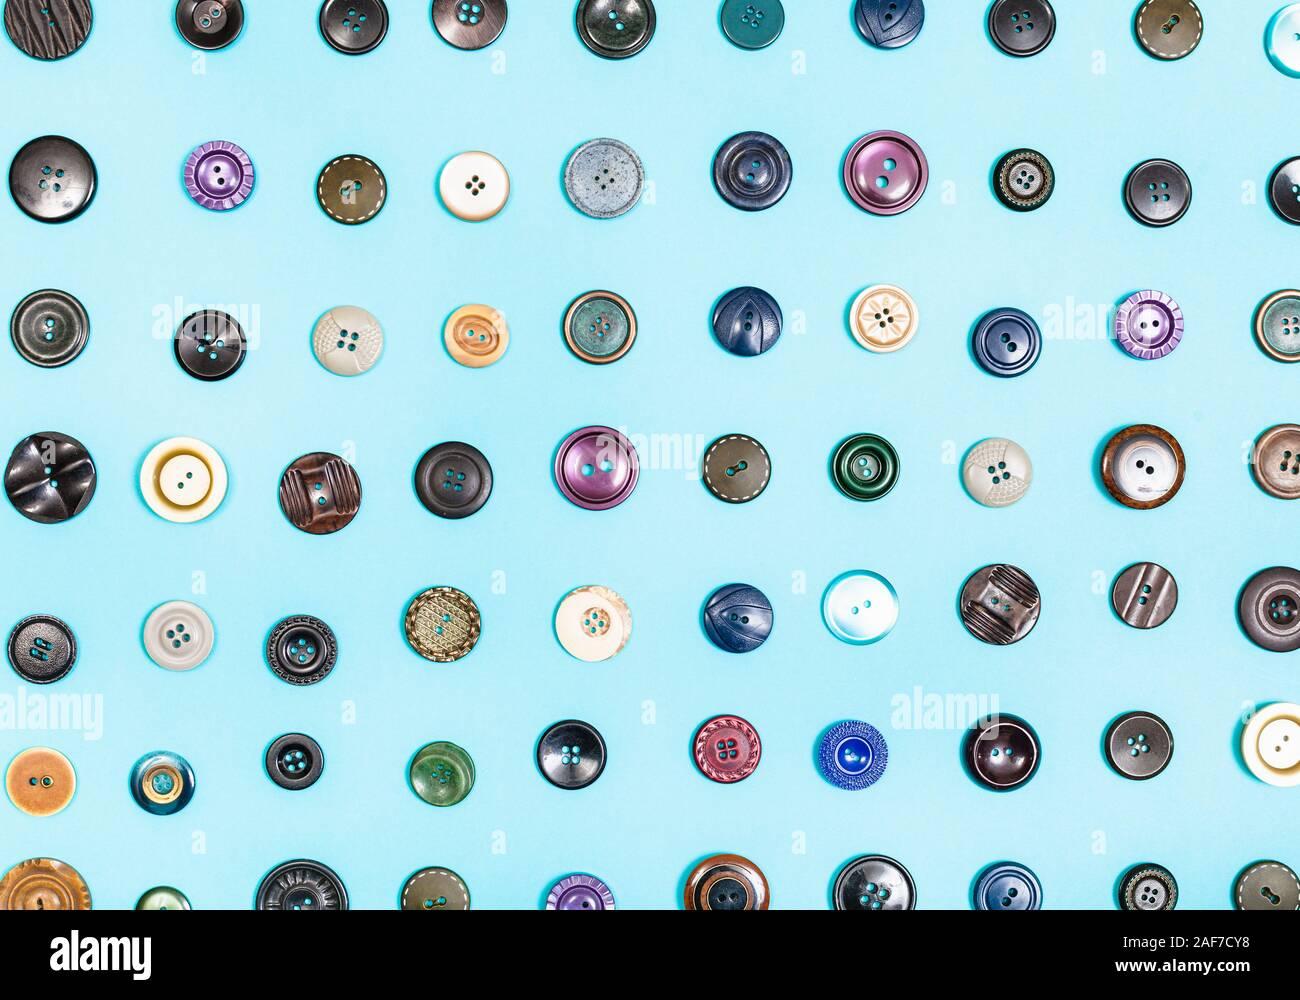 Vista superior de diversos botones organizados sobre fondo azul. Foto de stock